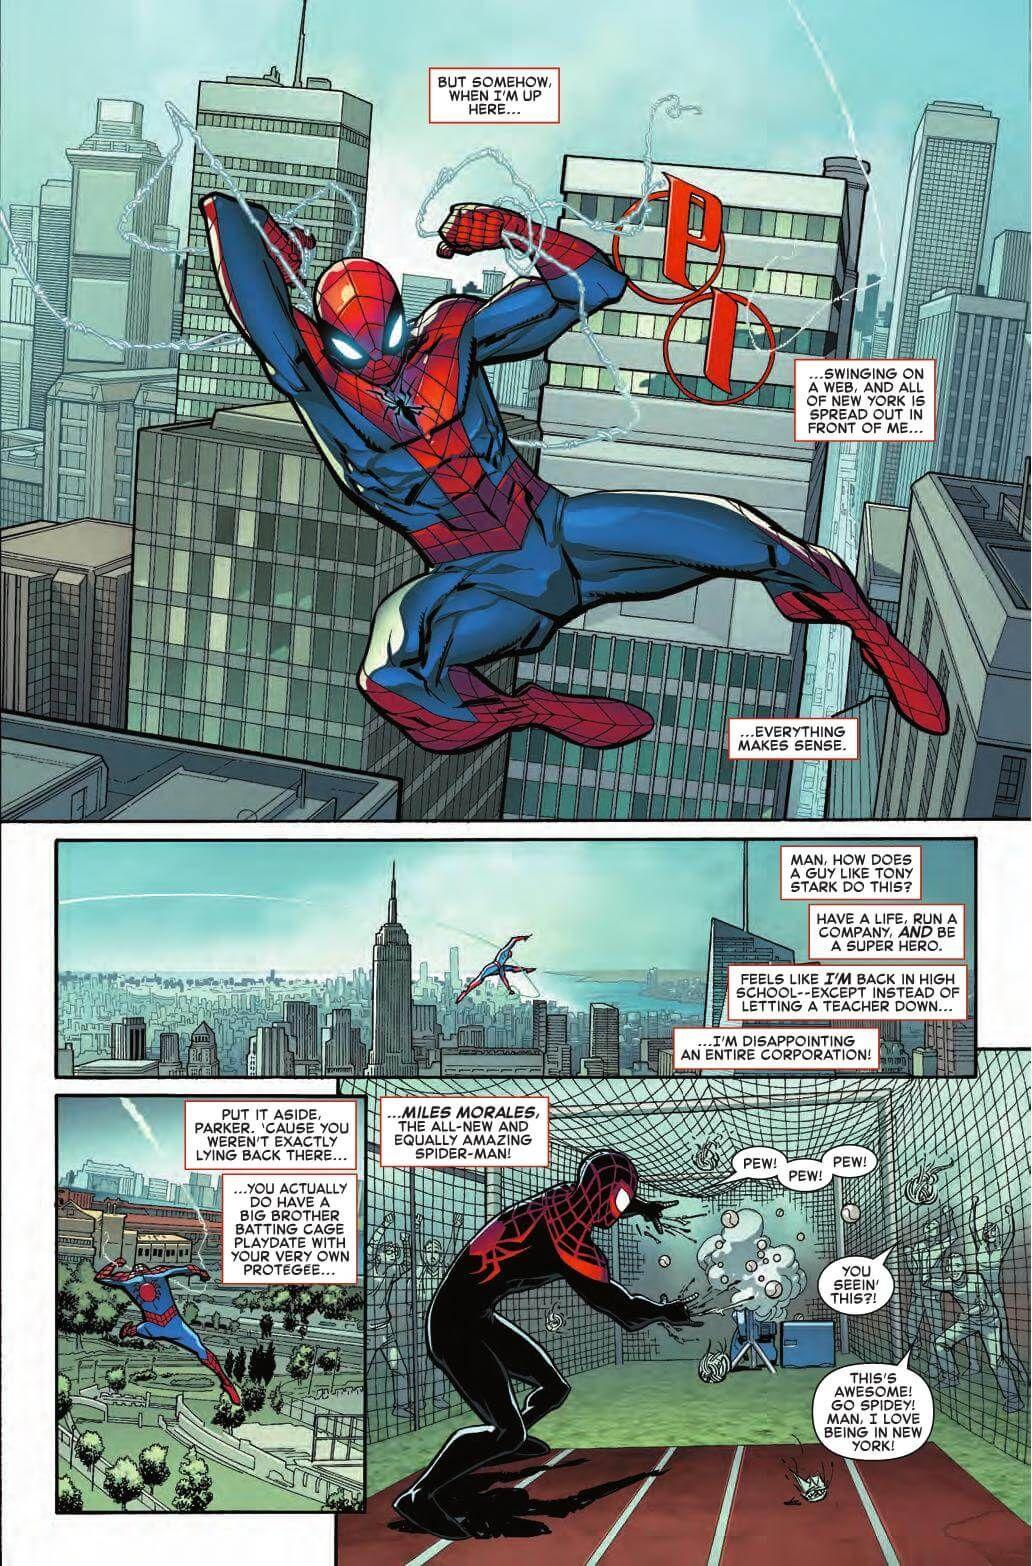 The Amazing Spider-Man #13, Marvel // Dan Slott.